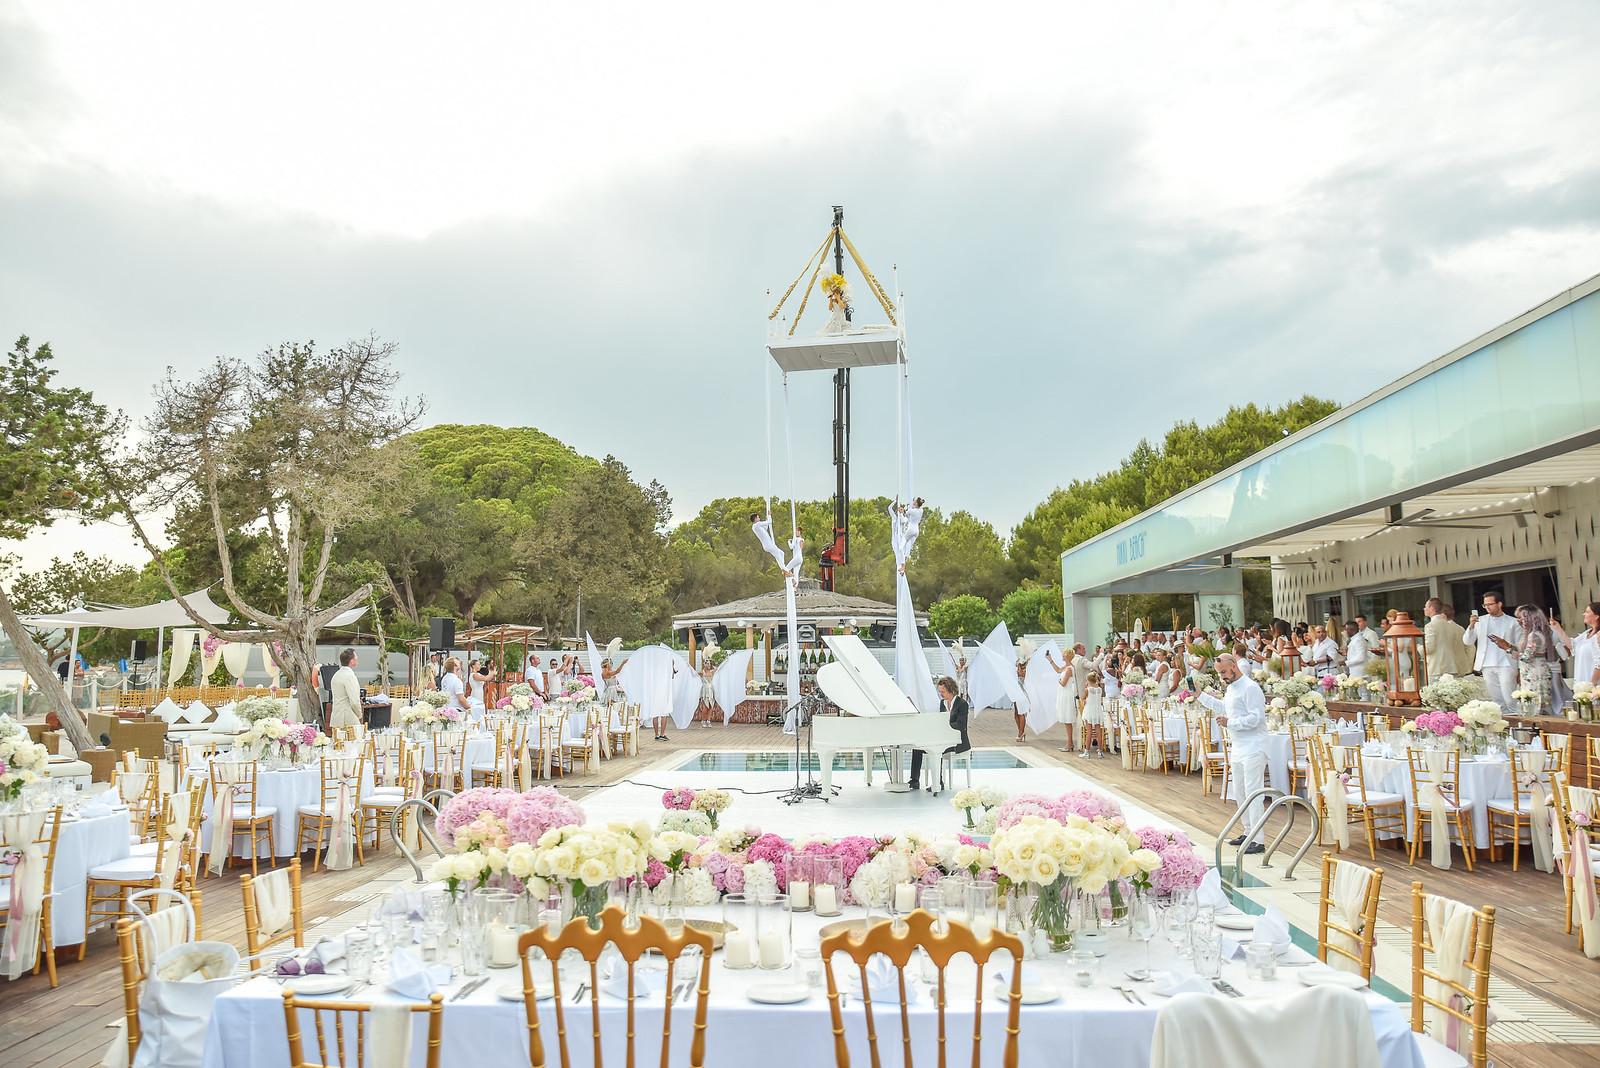 https://www.white-ibiza.com/wp-content/uploads/2020/07/white-ibiza-wedding-venue-nikki-beach-ibiza-2020-06.jpg